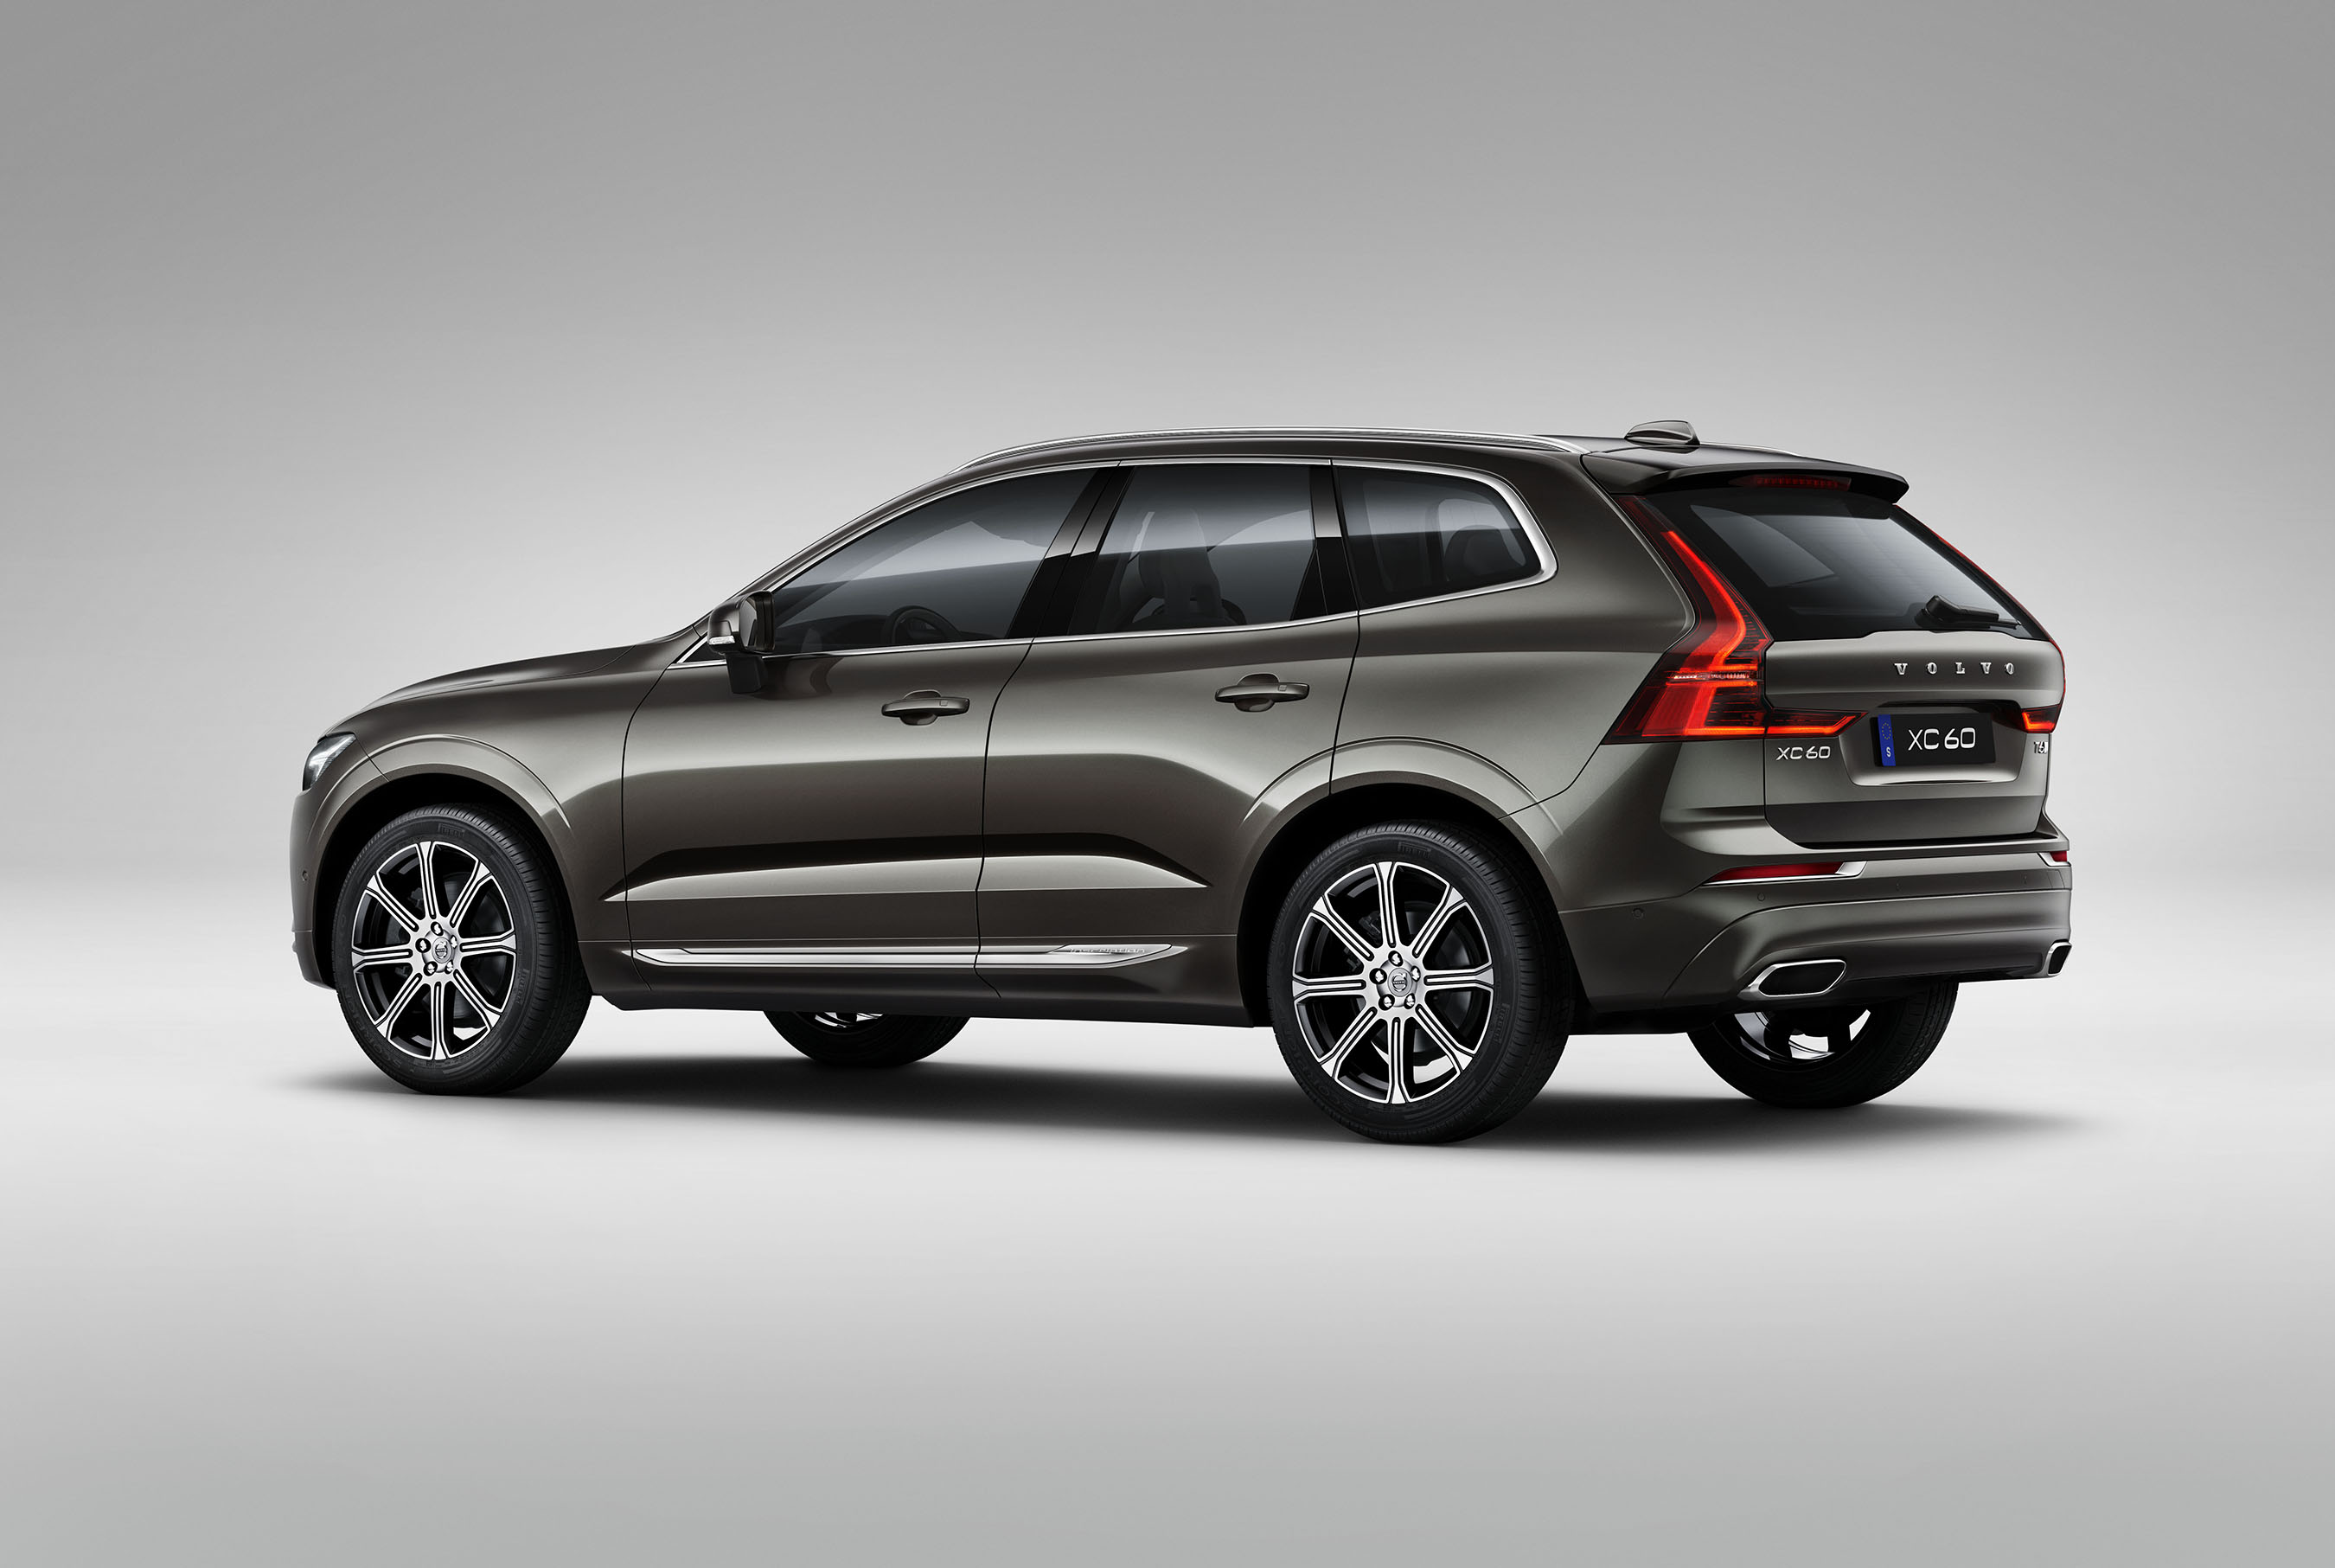 volvo cars reveals new xc60 premium suv. Black Bedroom Furniture Sets. Home Design Ideas